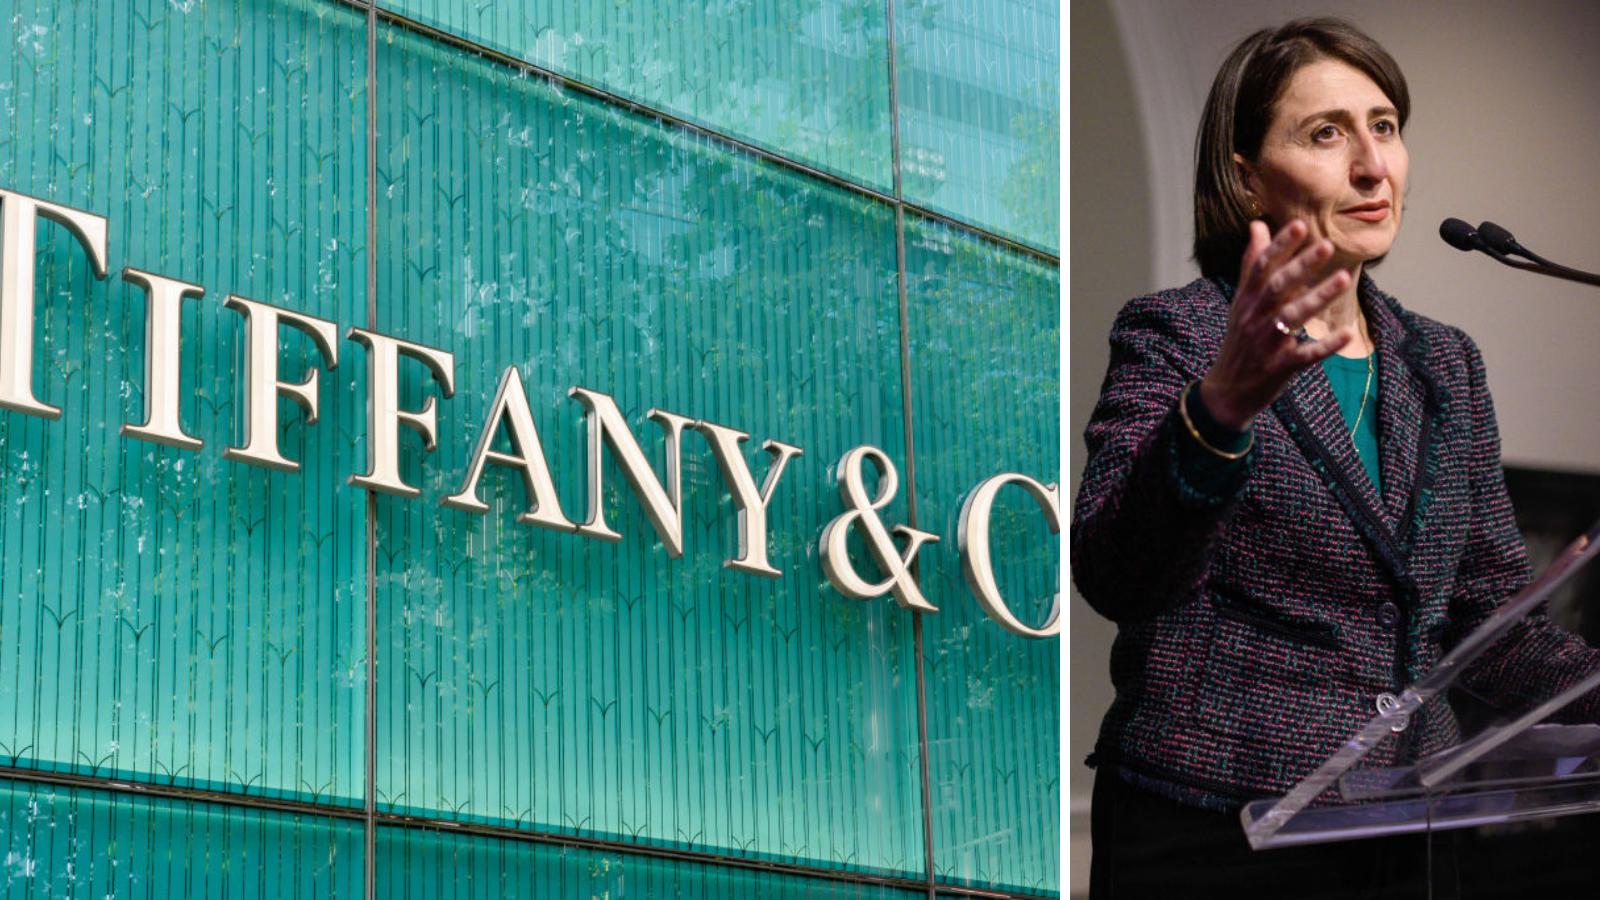 Tiffany & Co sues Sydney metro project for $109 million